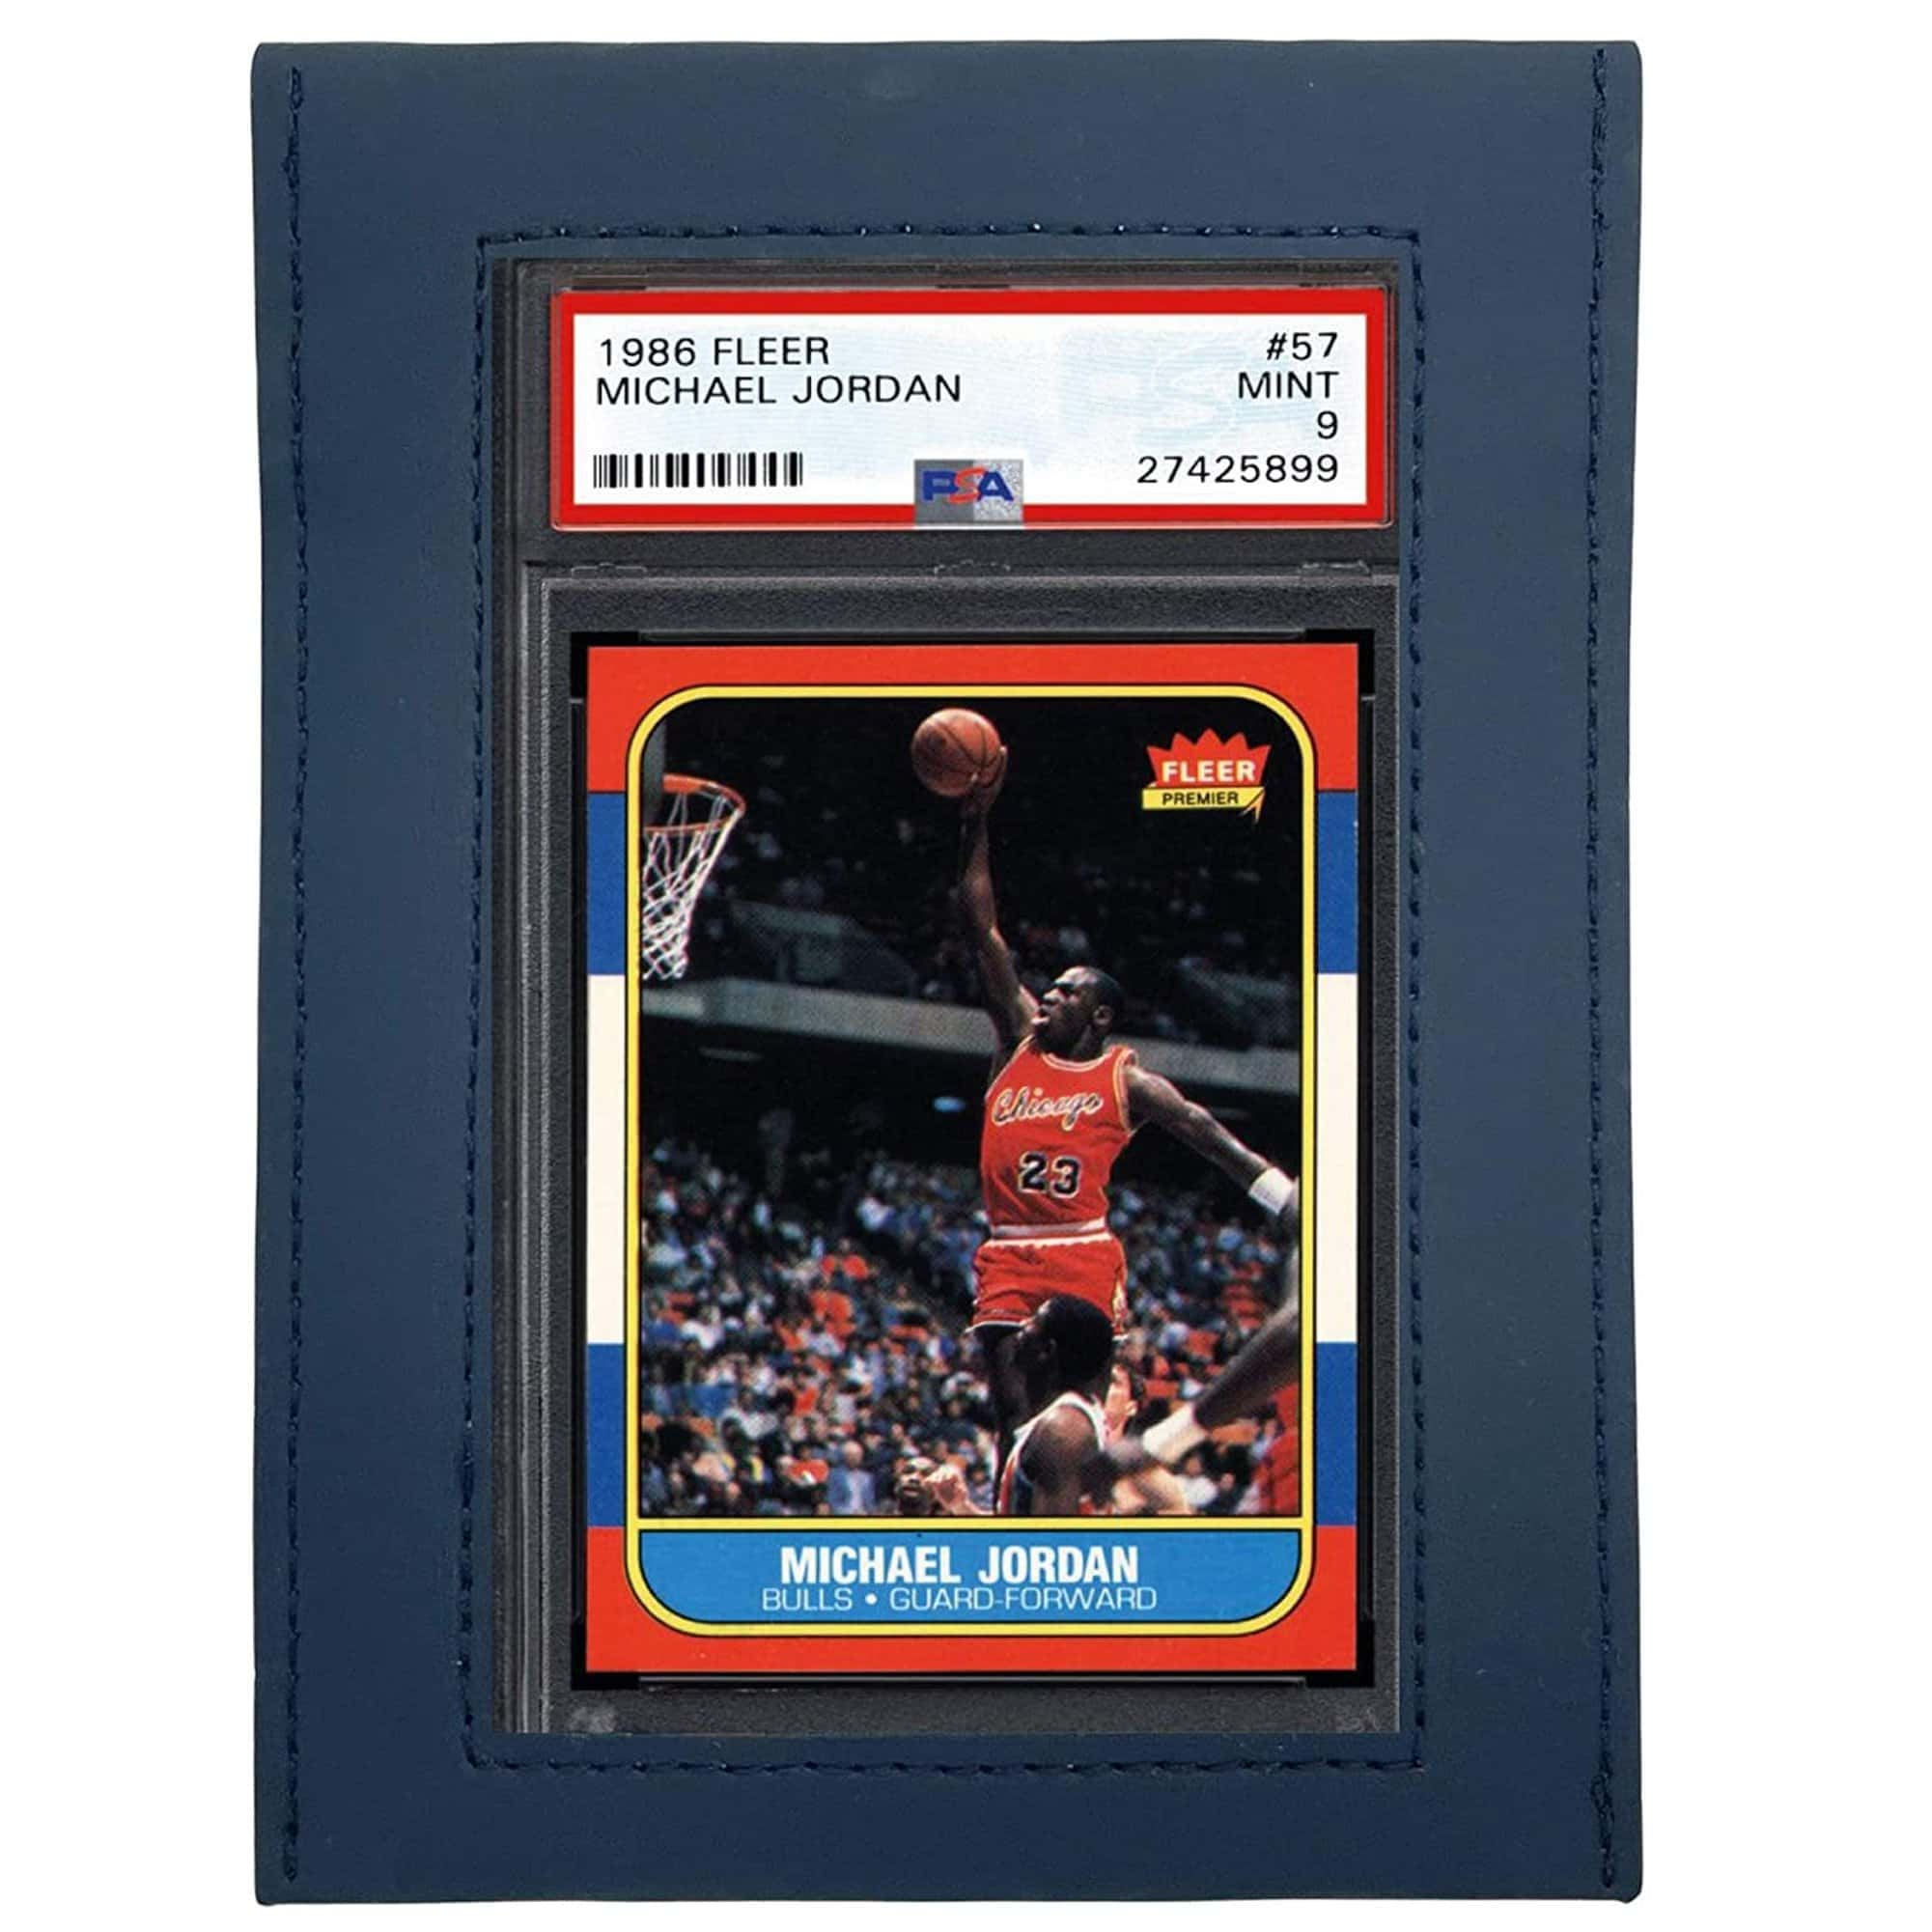 UV Protective Graded Card Sleeve Large Window With Michael Jordan PSA Card